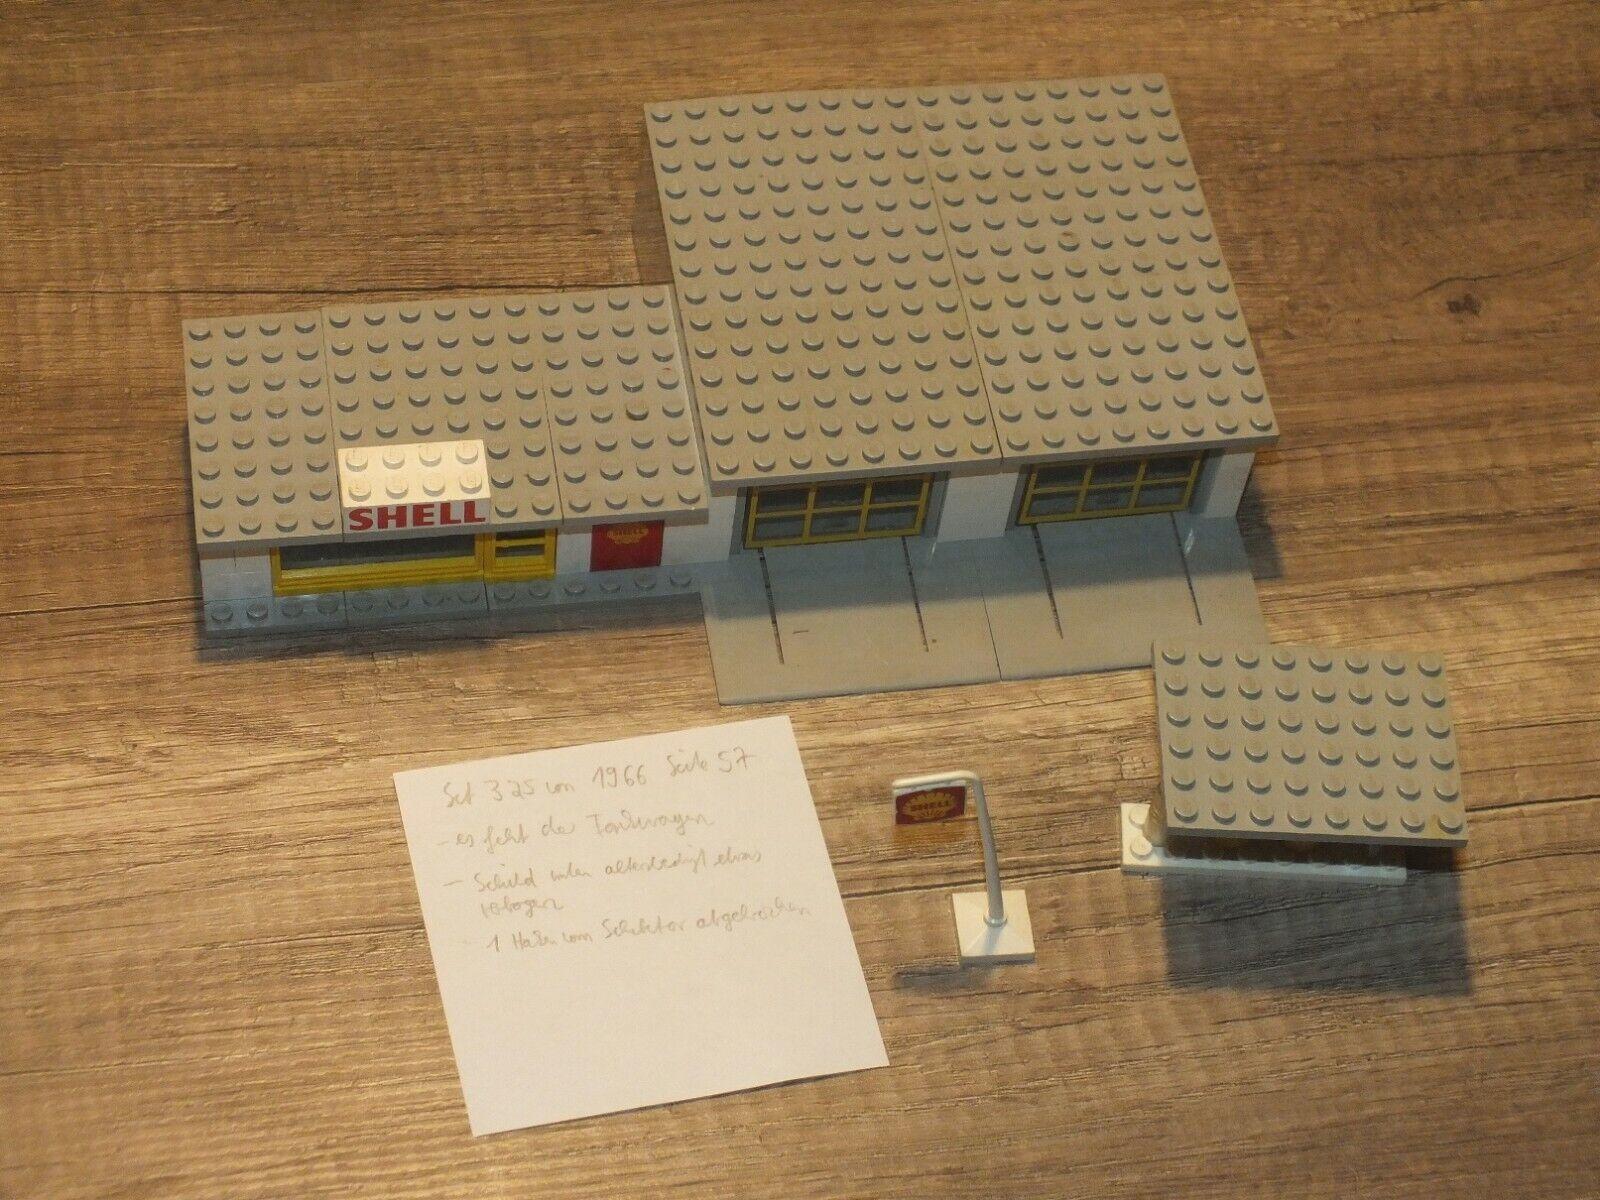 Lego Set 325 Shell Service Station Tankstelle Vintage City von 1966